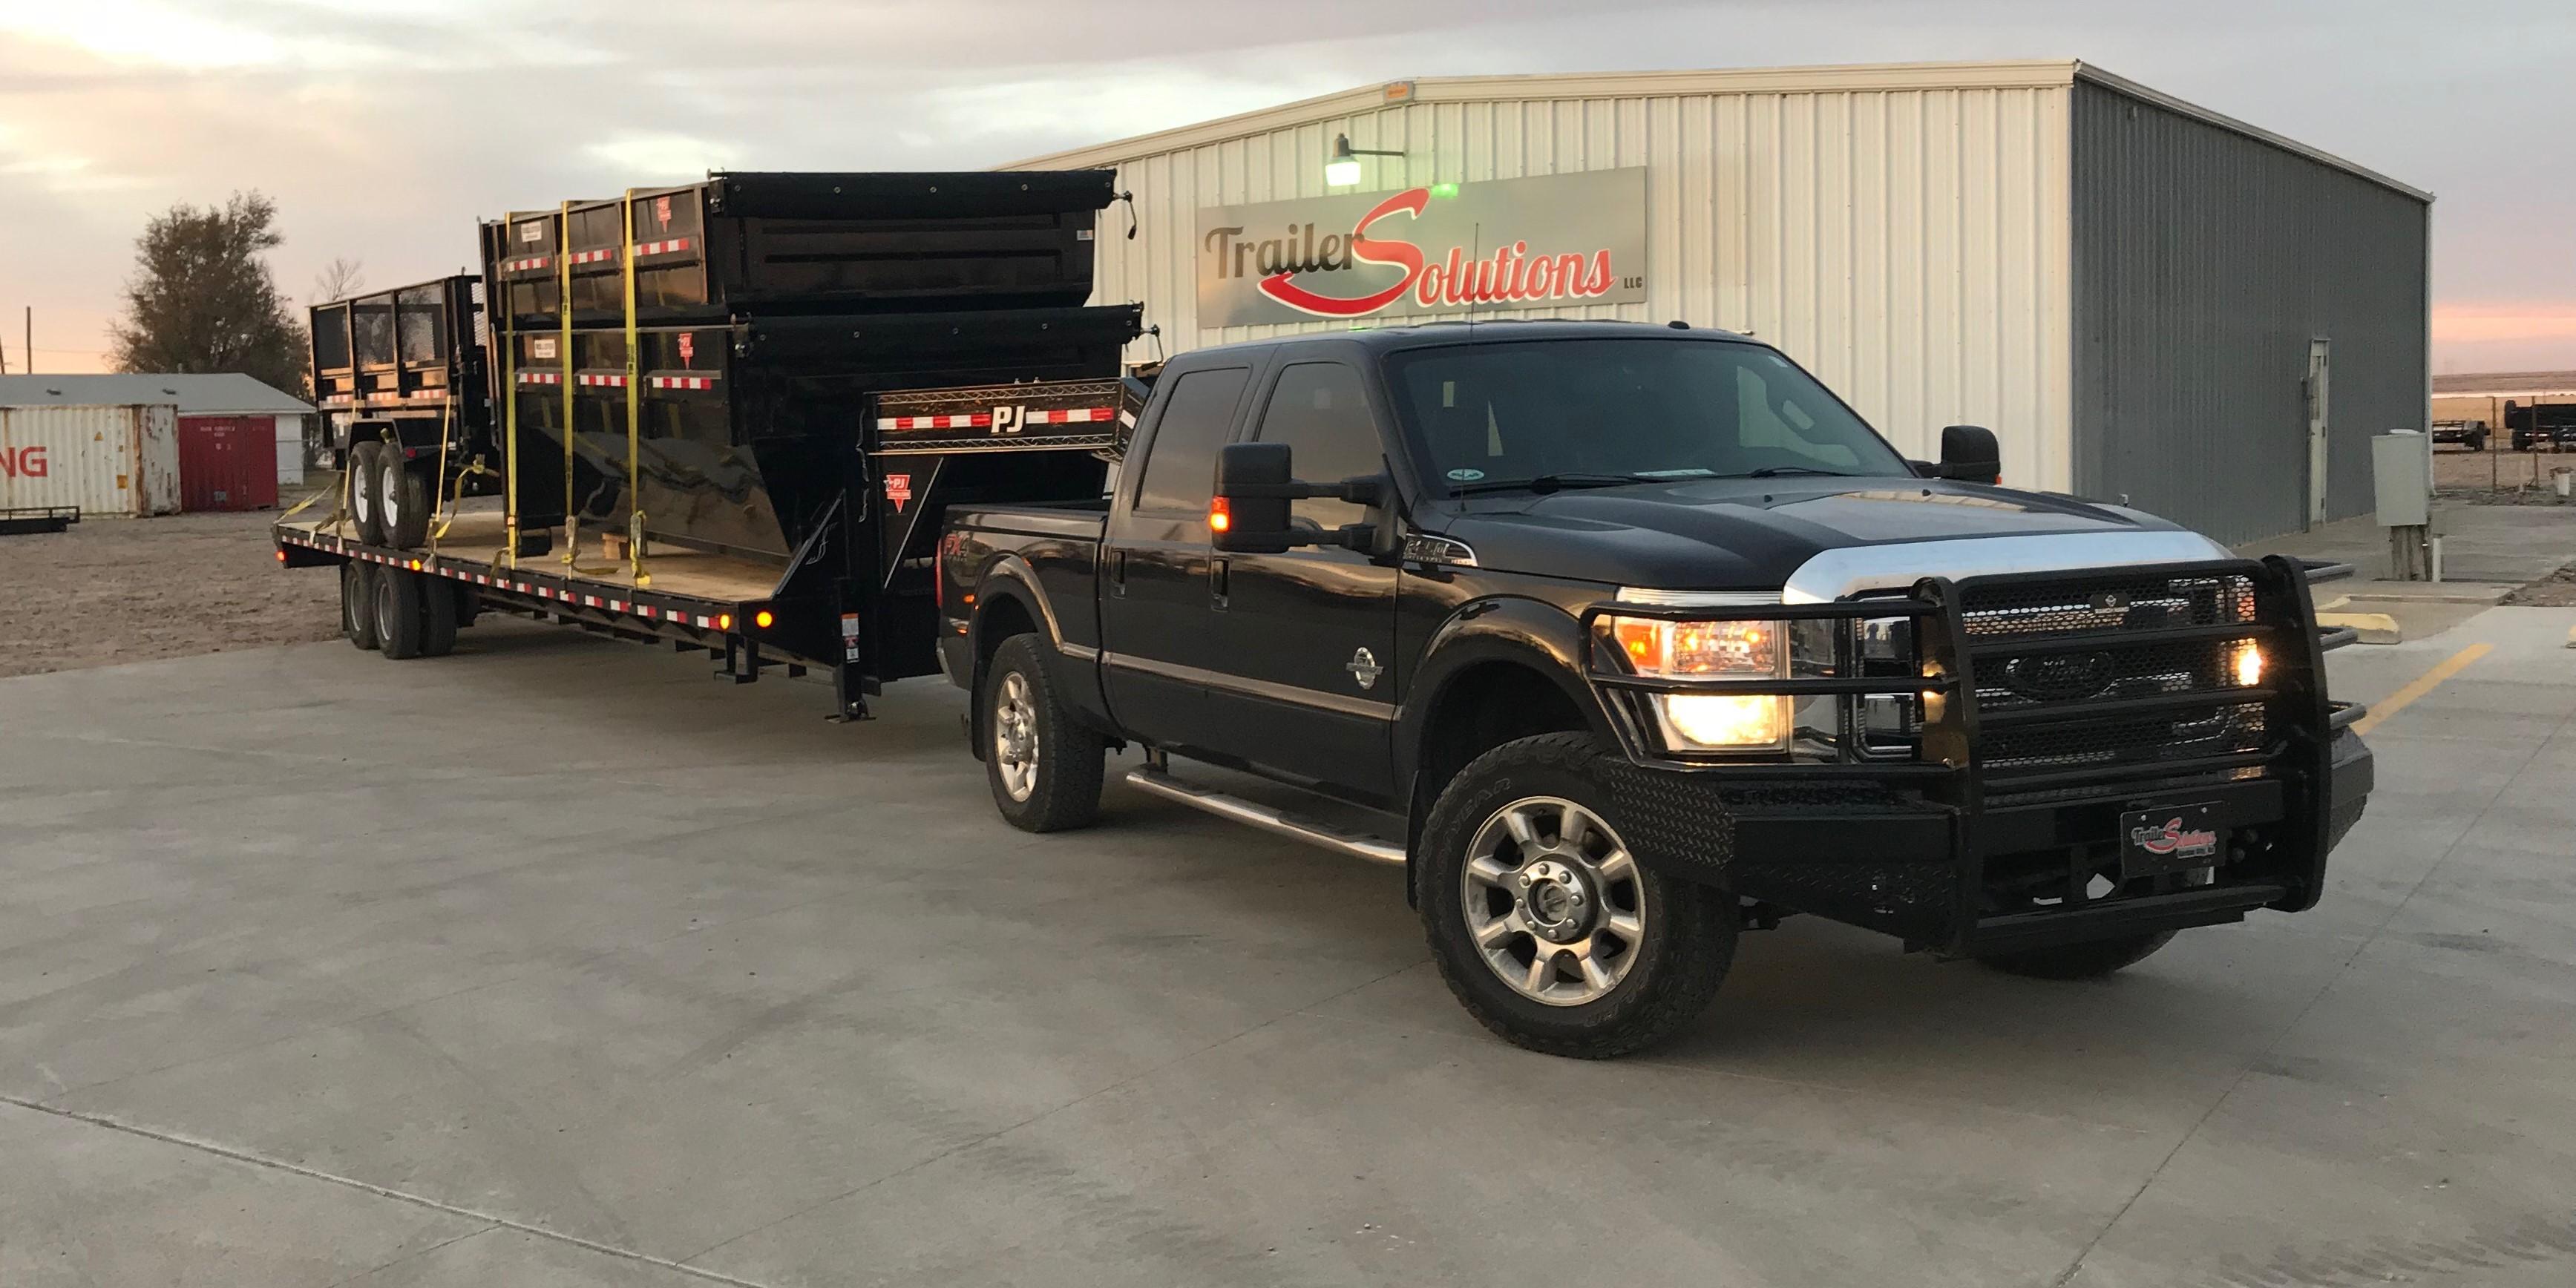 Home   Trailer Solutions   PJ Trailer car hauler, dump, flat bed and  utility sales in Garden City, KS